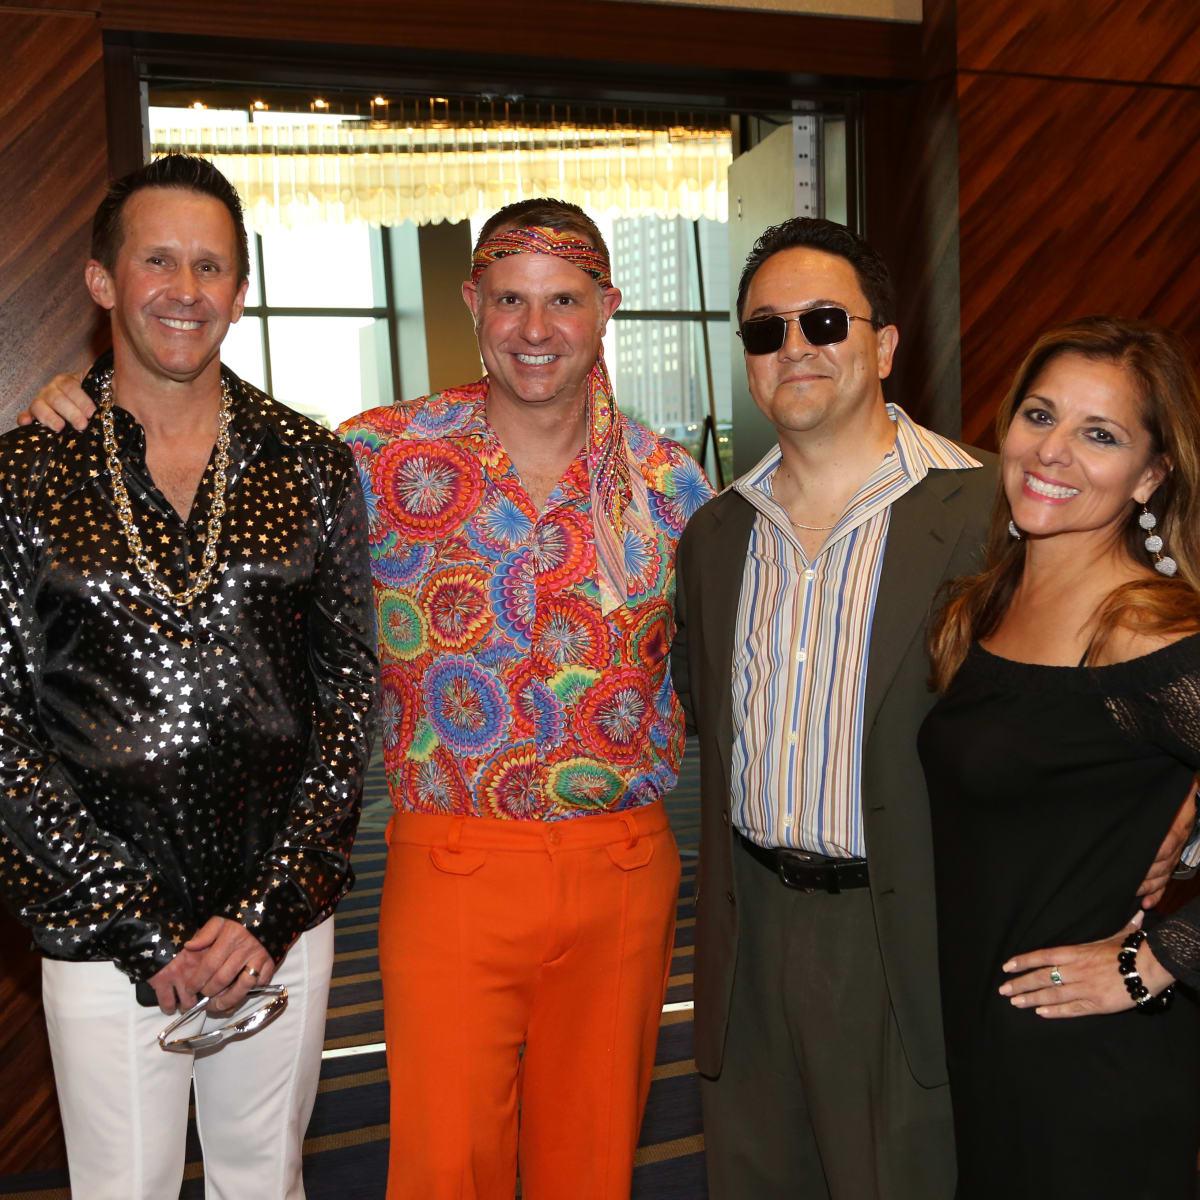 Thom McDaniel, Lance Menster, Carl Salazar, Sandra Ramirez Aultman at Houston Area Women's Center Gala